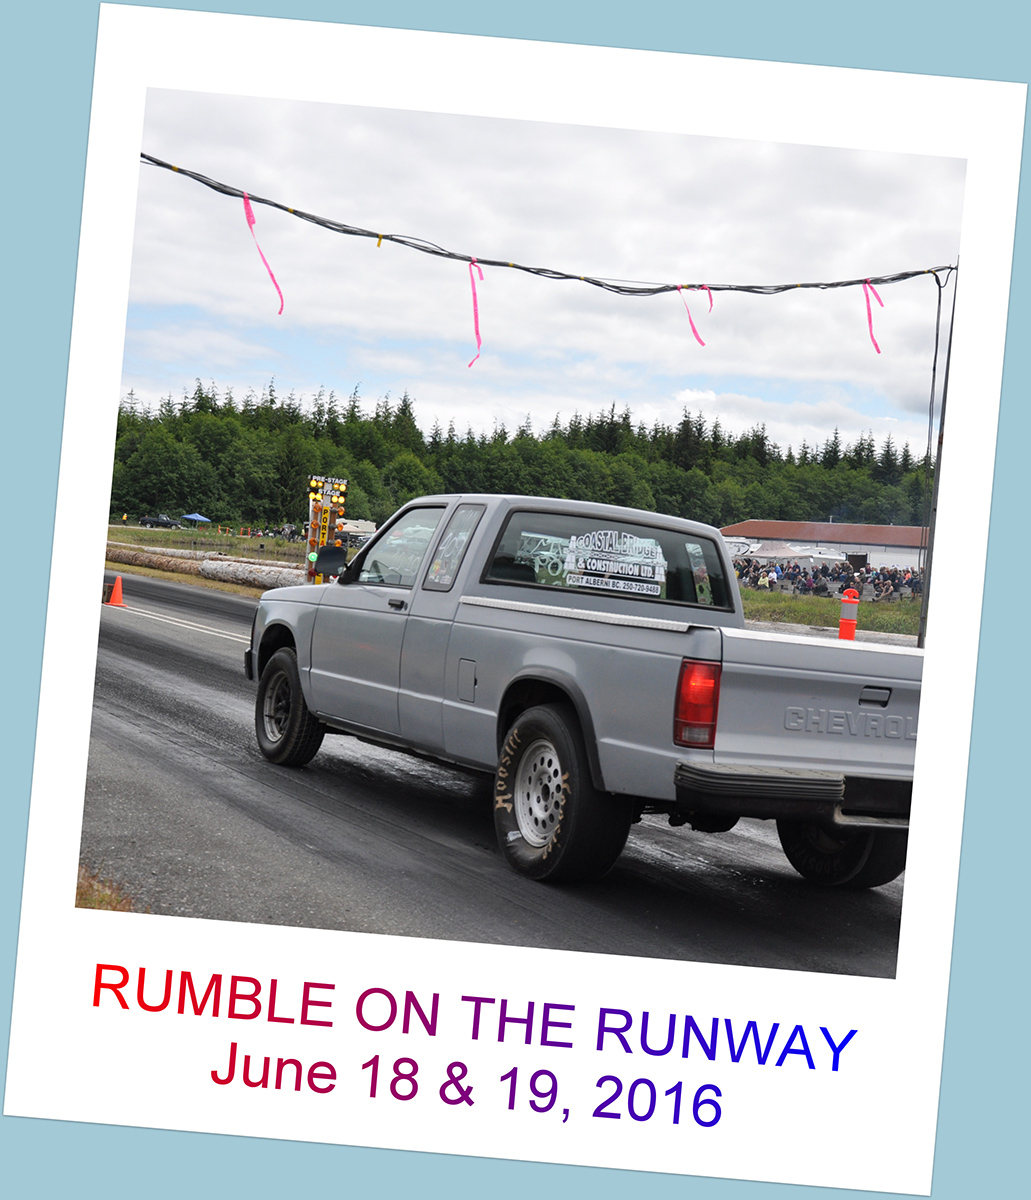 Rumble on the Runway June 18 & 19, 2016 559